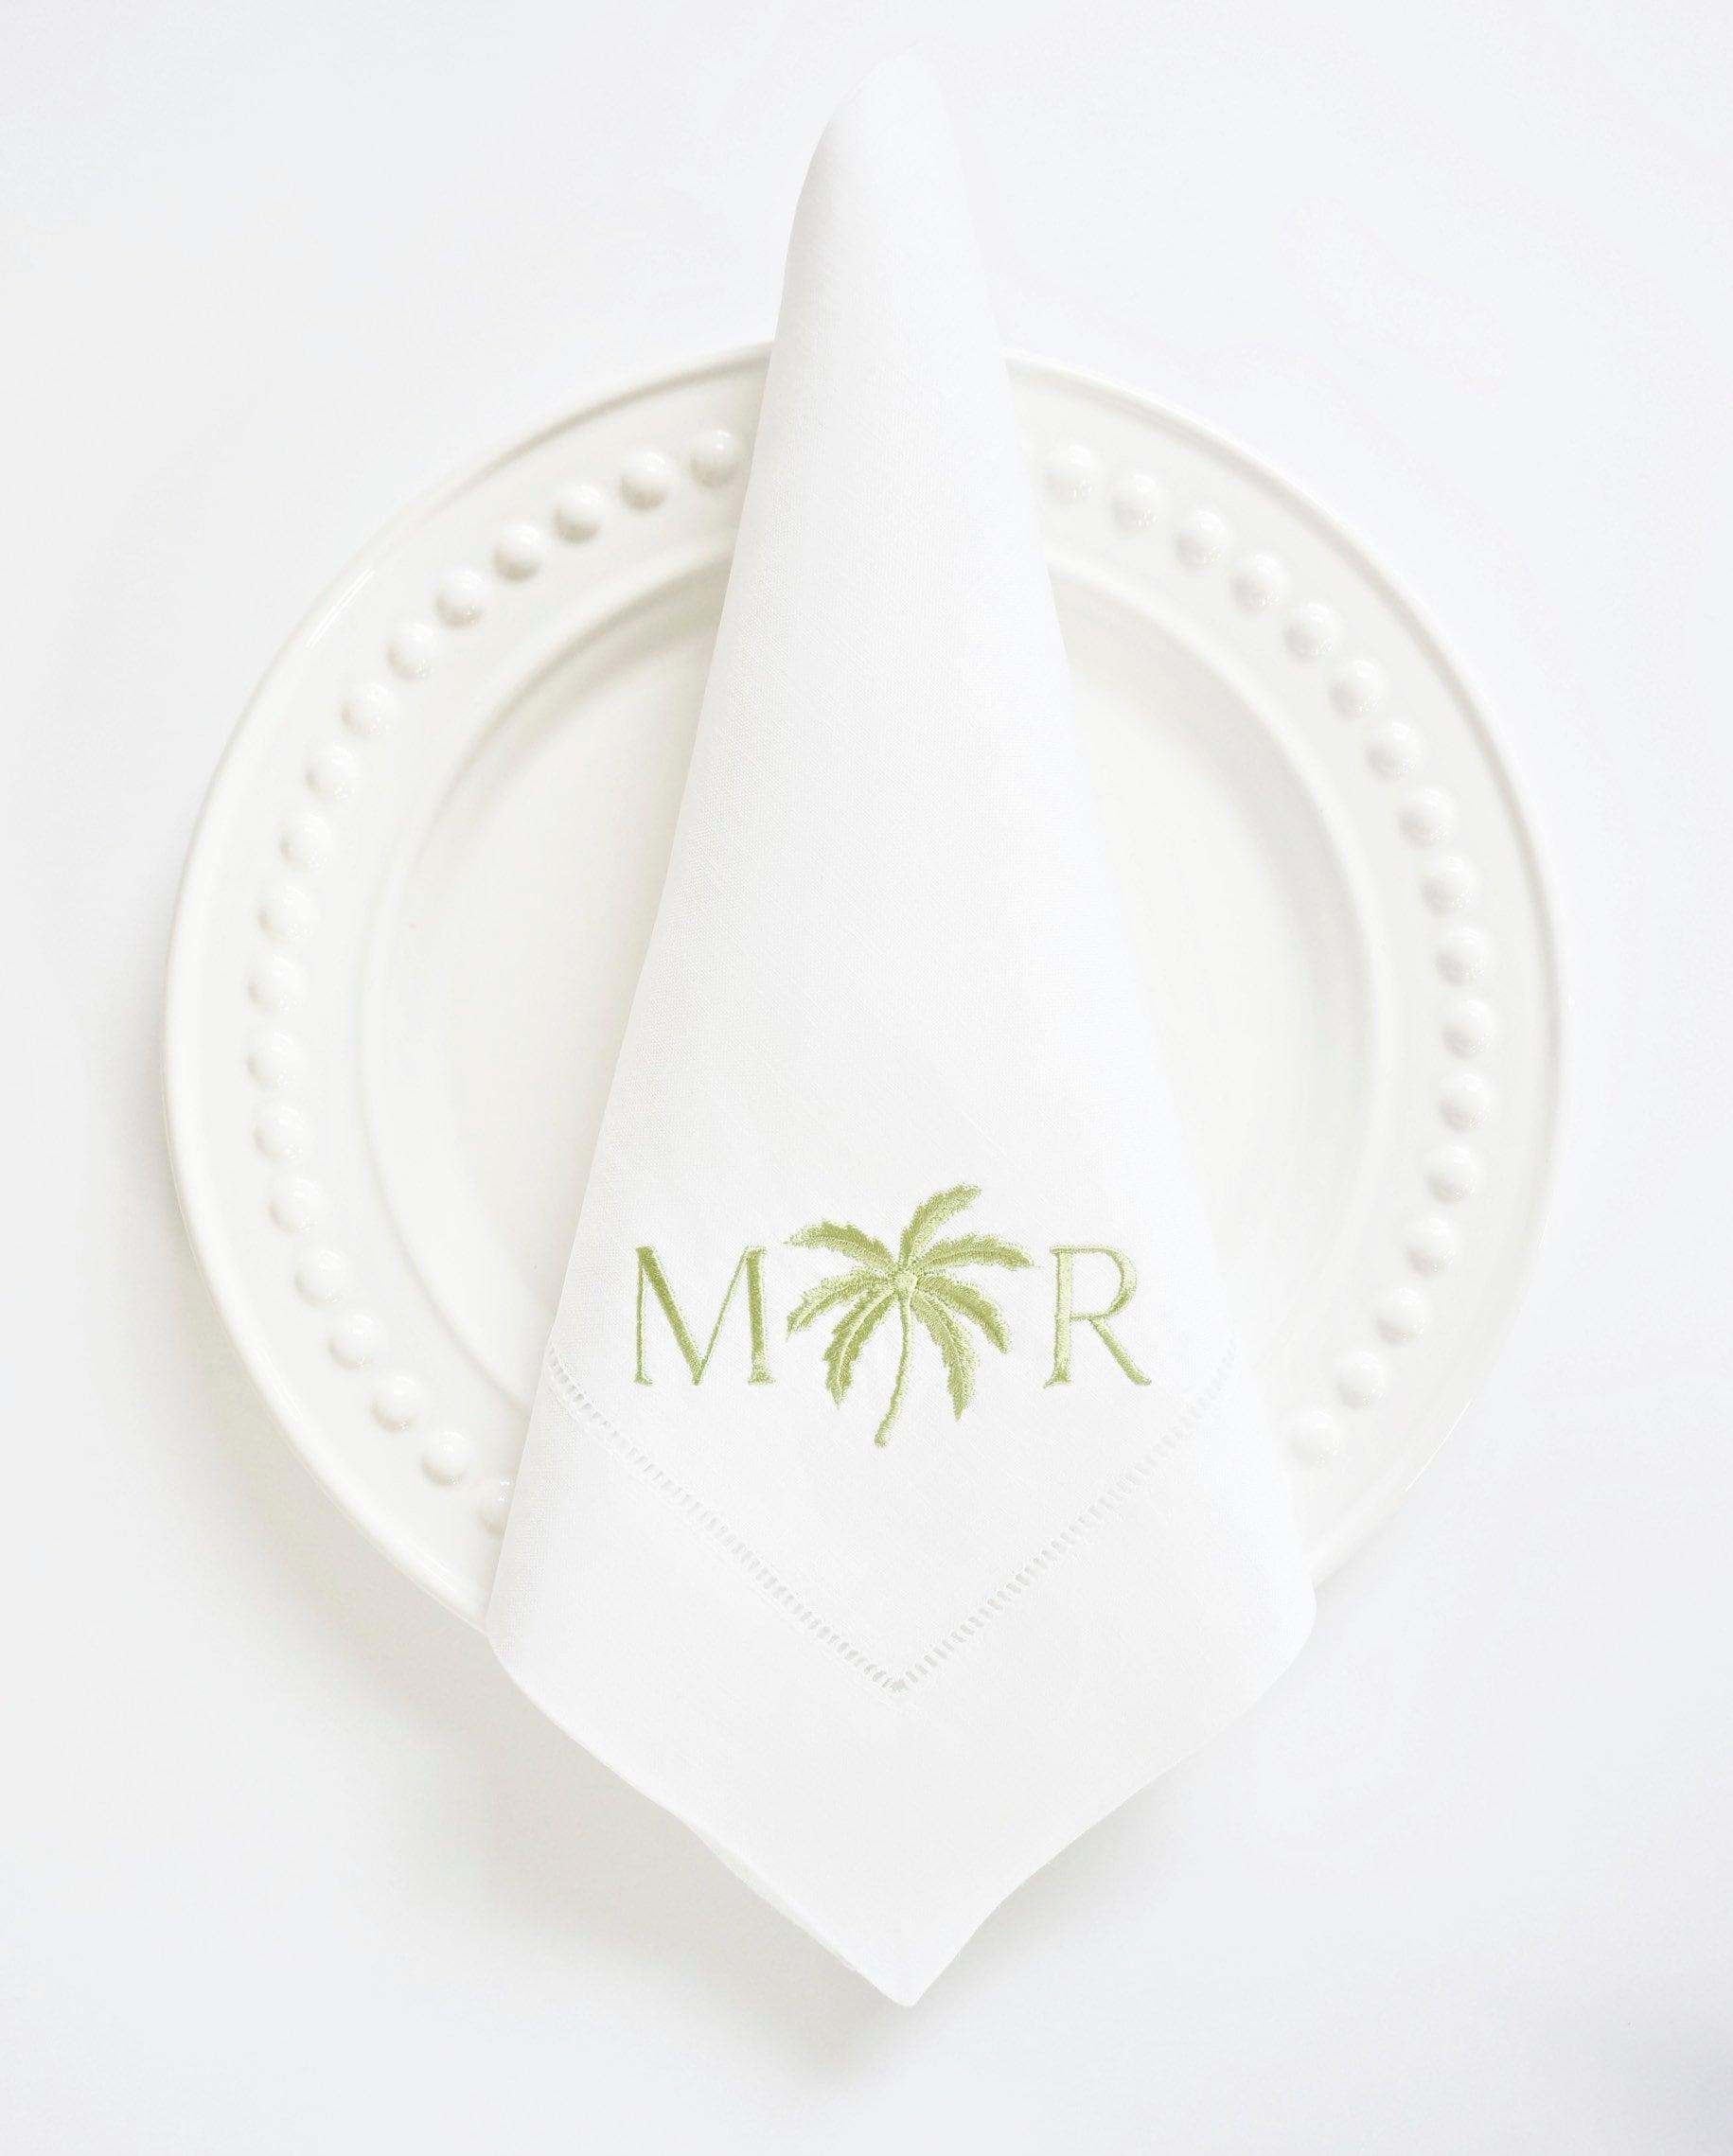 PALM TREE Monogram Embroidered Dinner Napkins, Linen ...